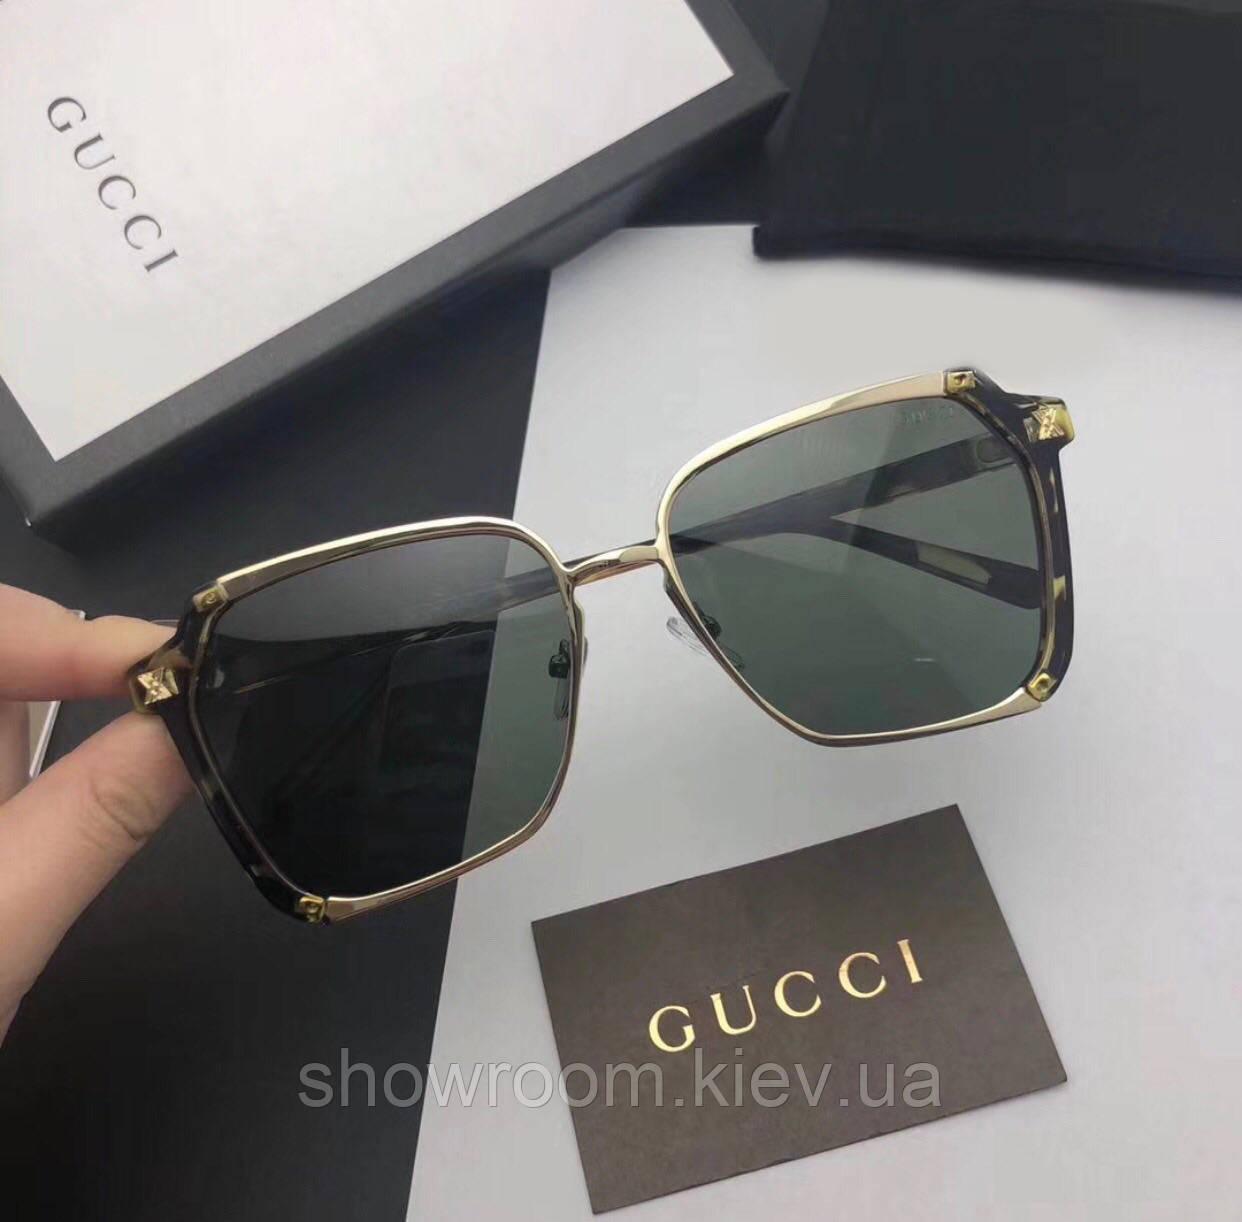 Женские солнцезащитные очки в стиле GUCCI (55934) leo